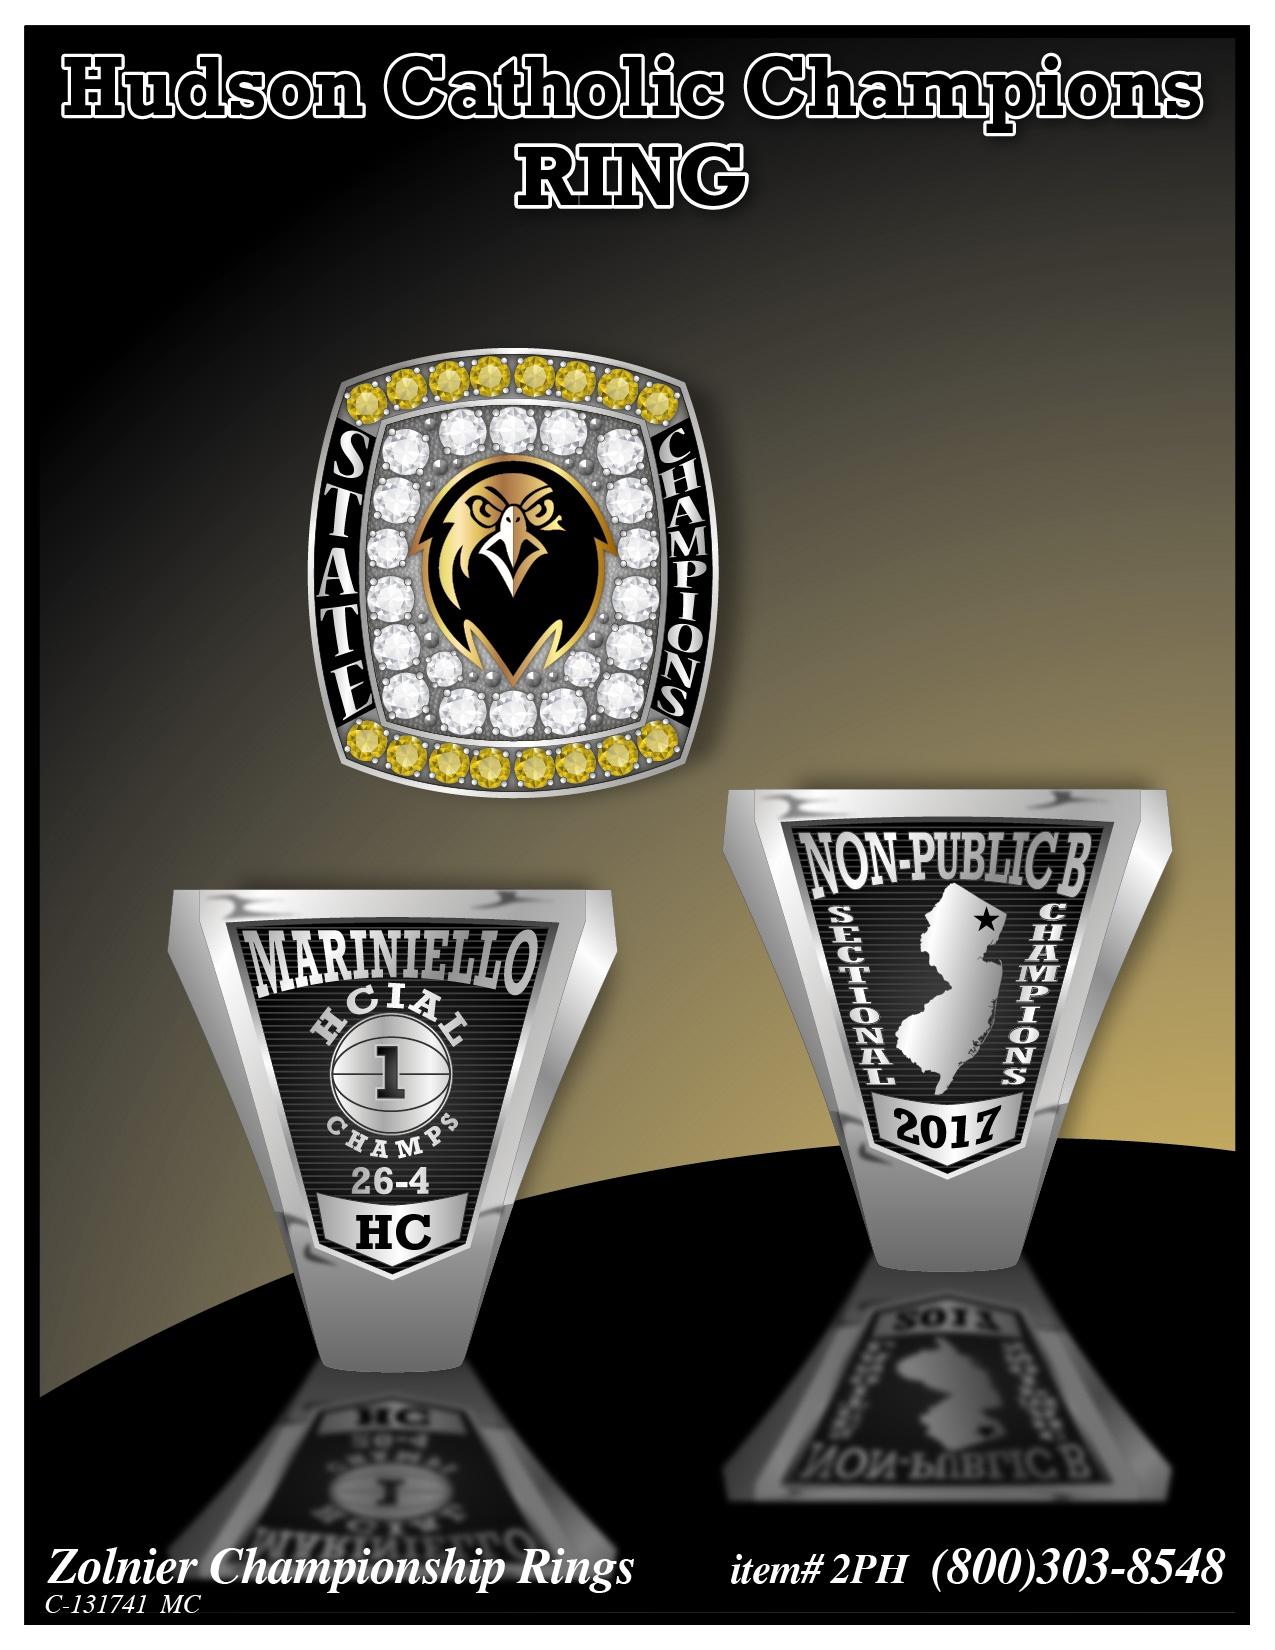 C-131741 Hudson Catholic Basketball Championship Ring